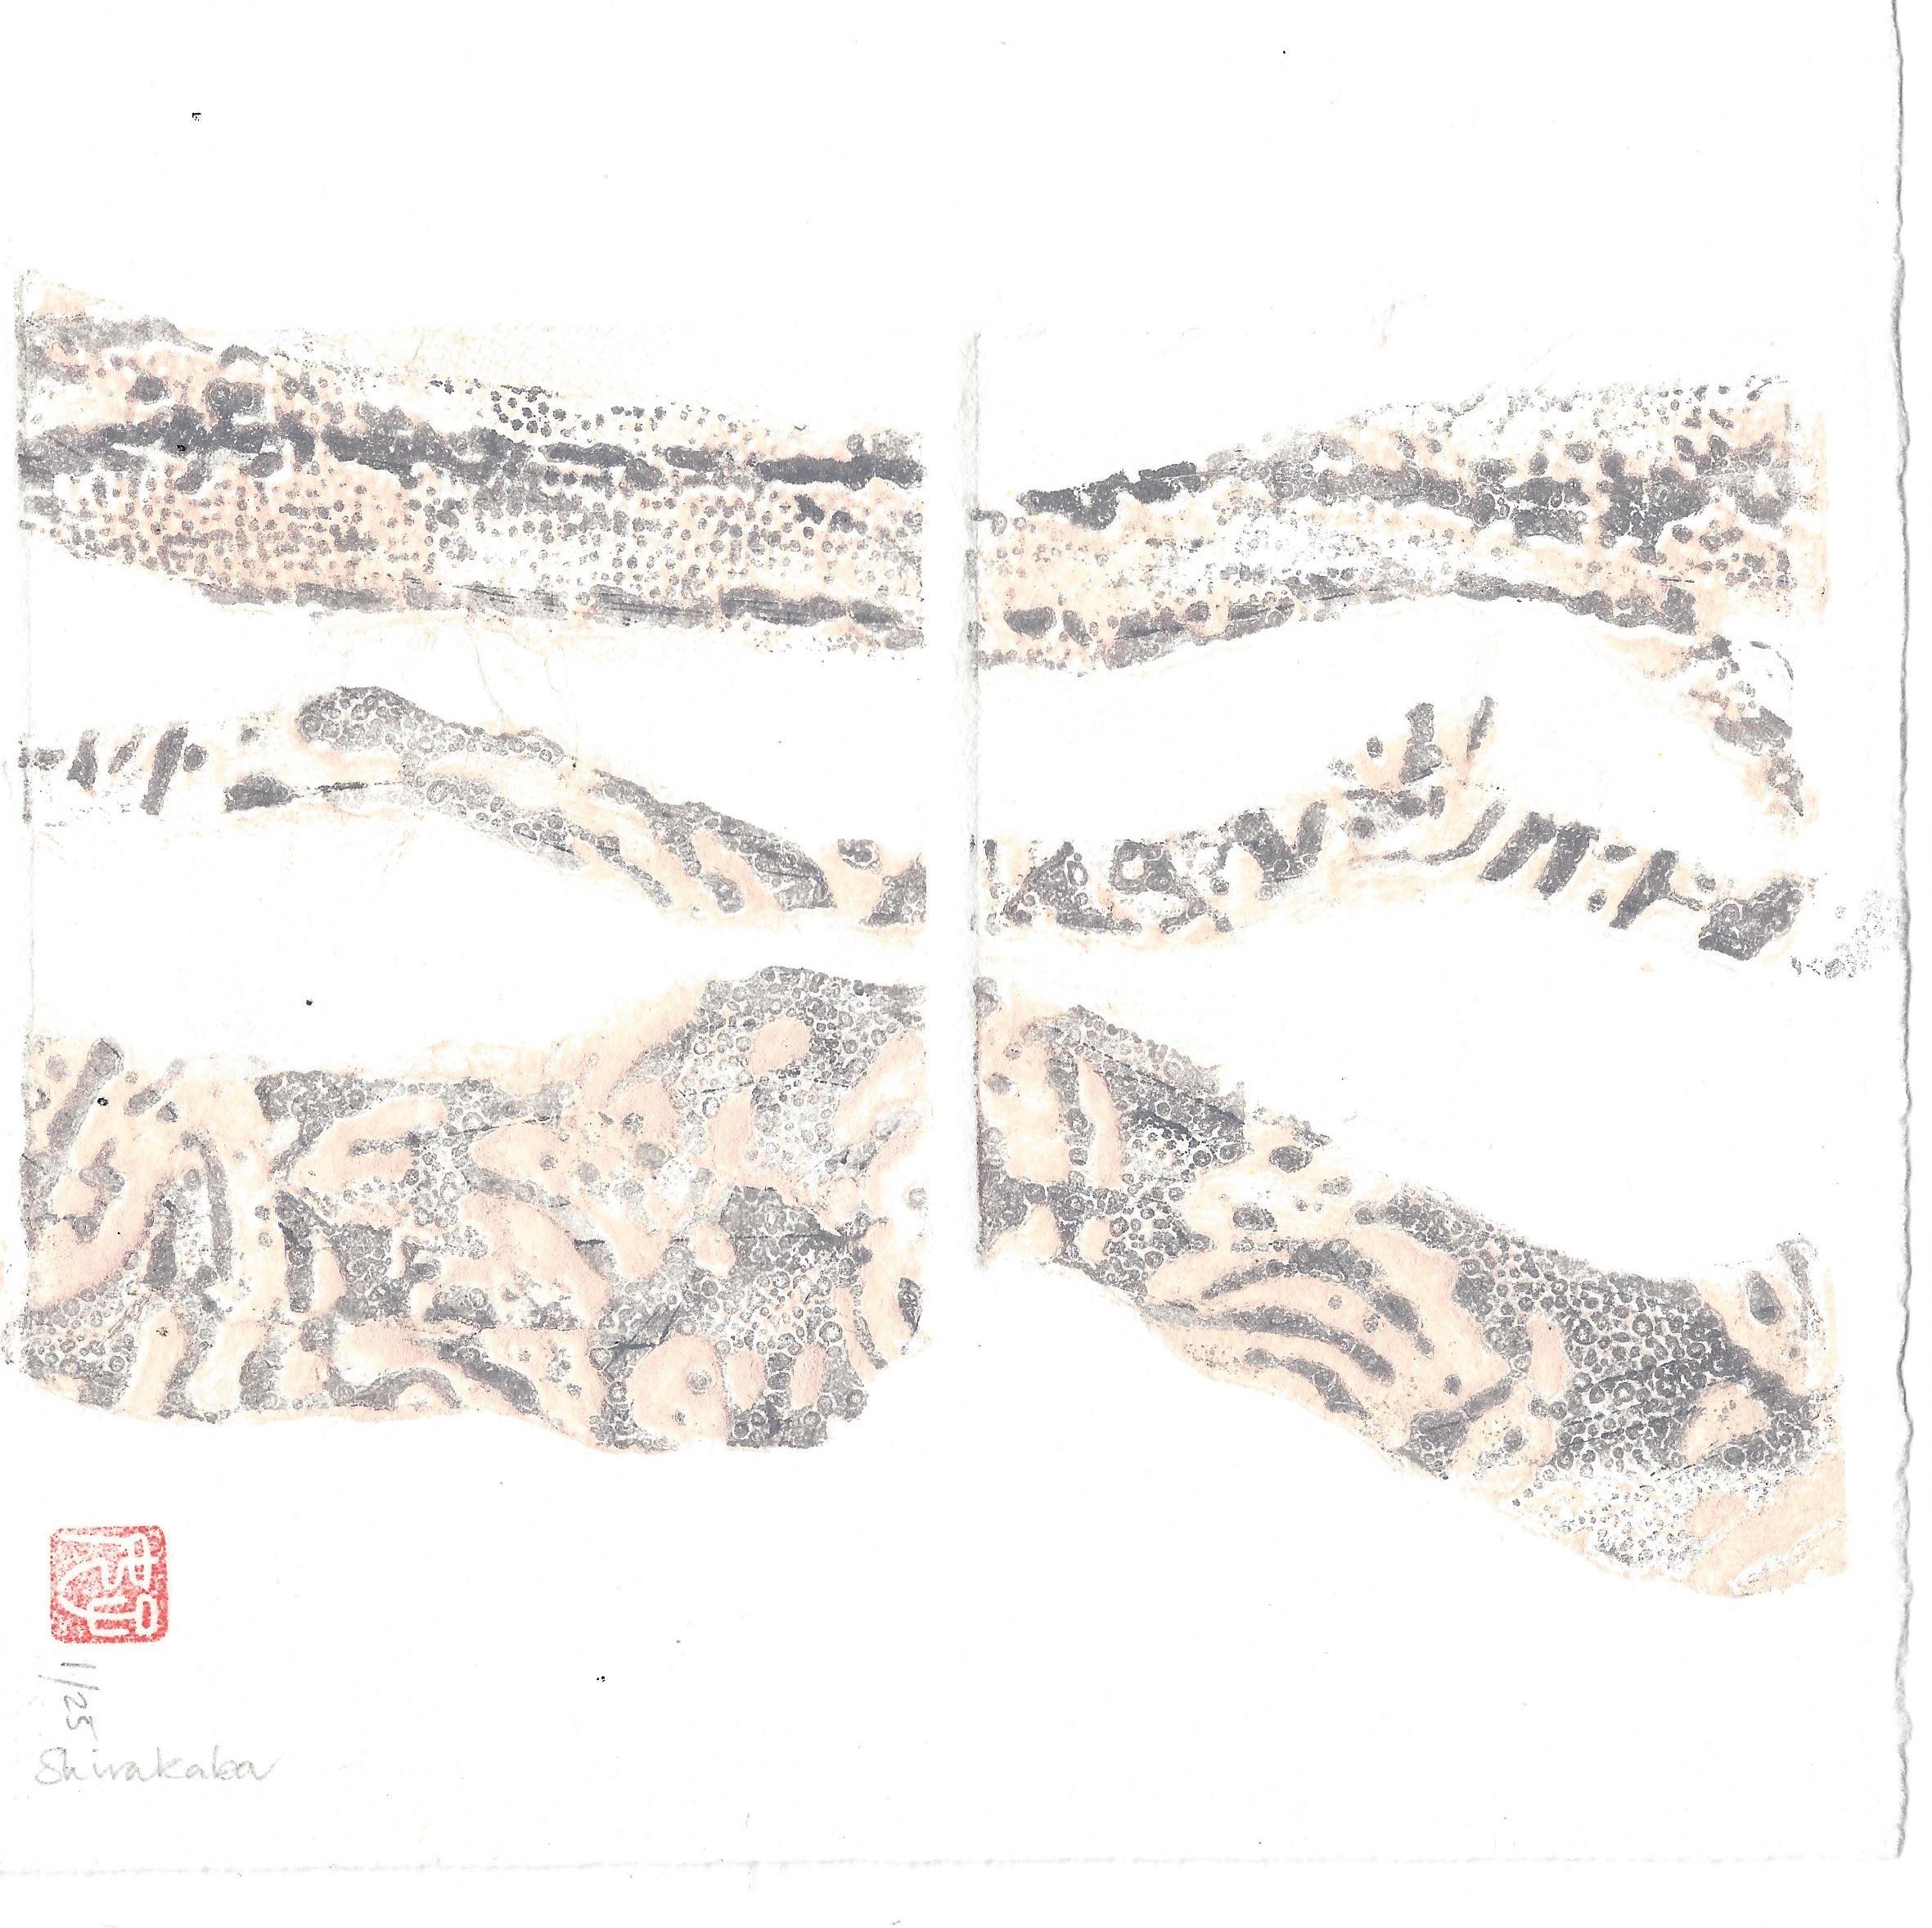 Shirakaba - S Maddocks - Hazelnut Press